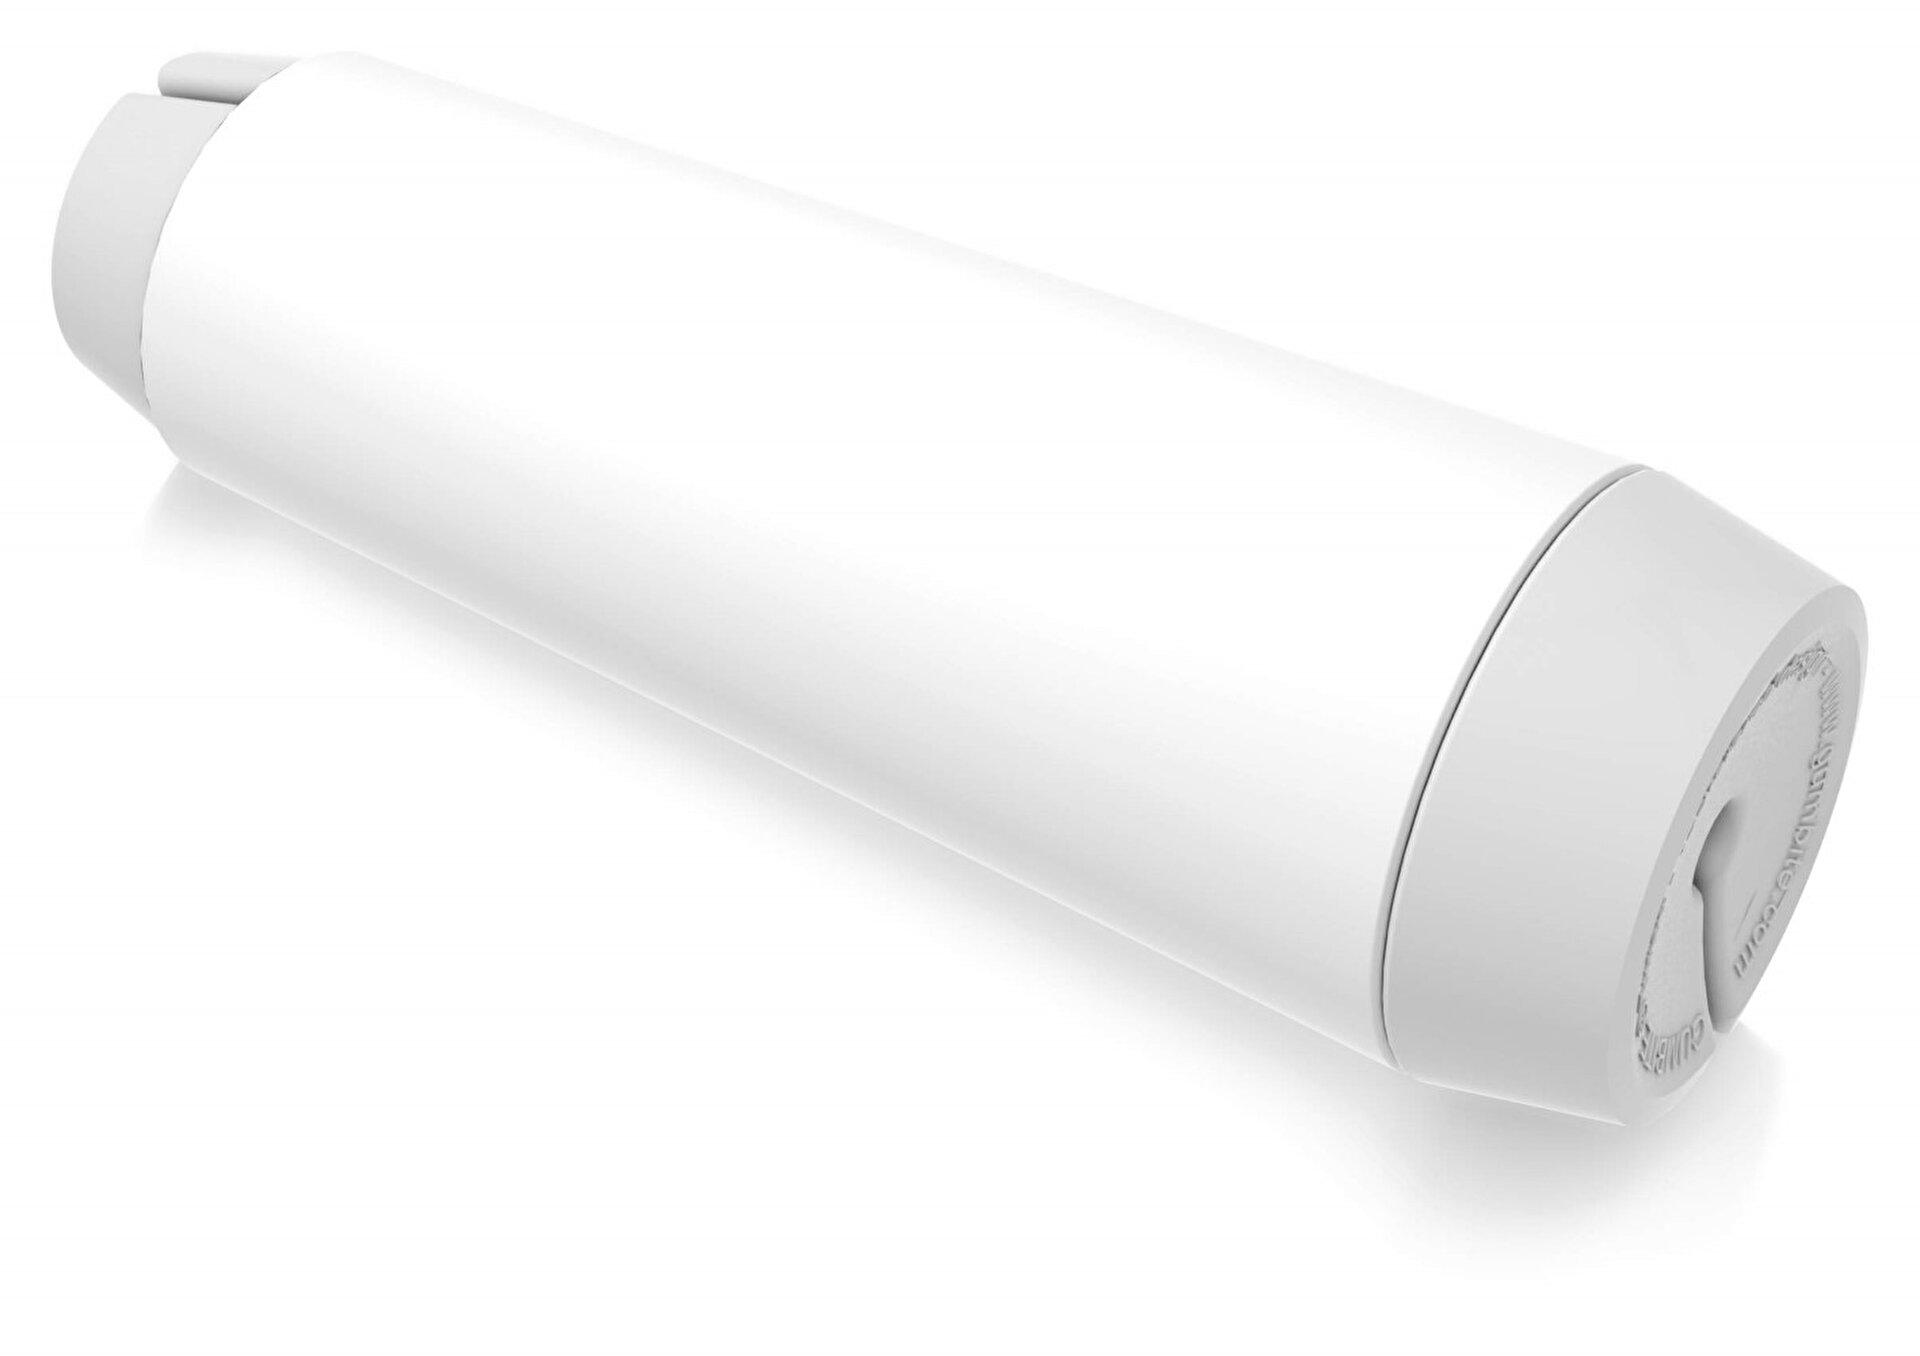 Picture of Gumbite Makaralı Kablo Toplayıcı